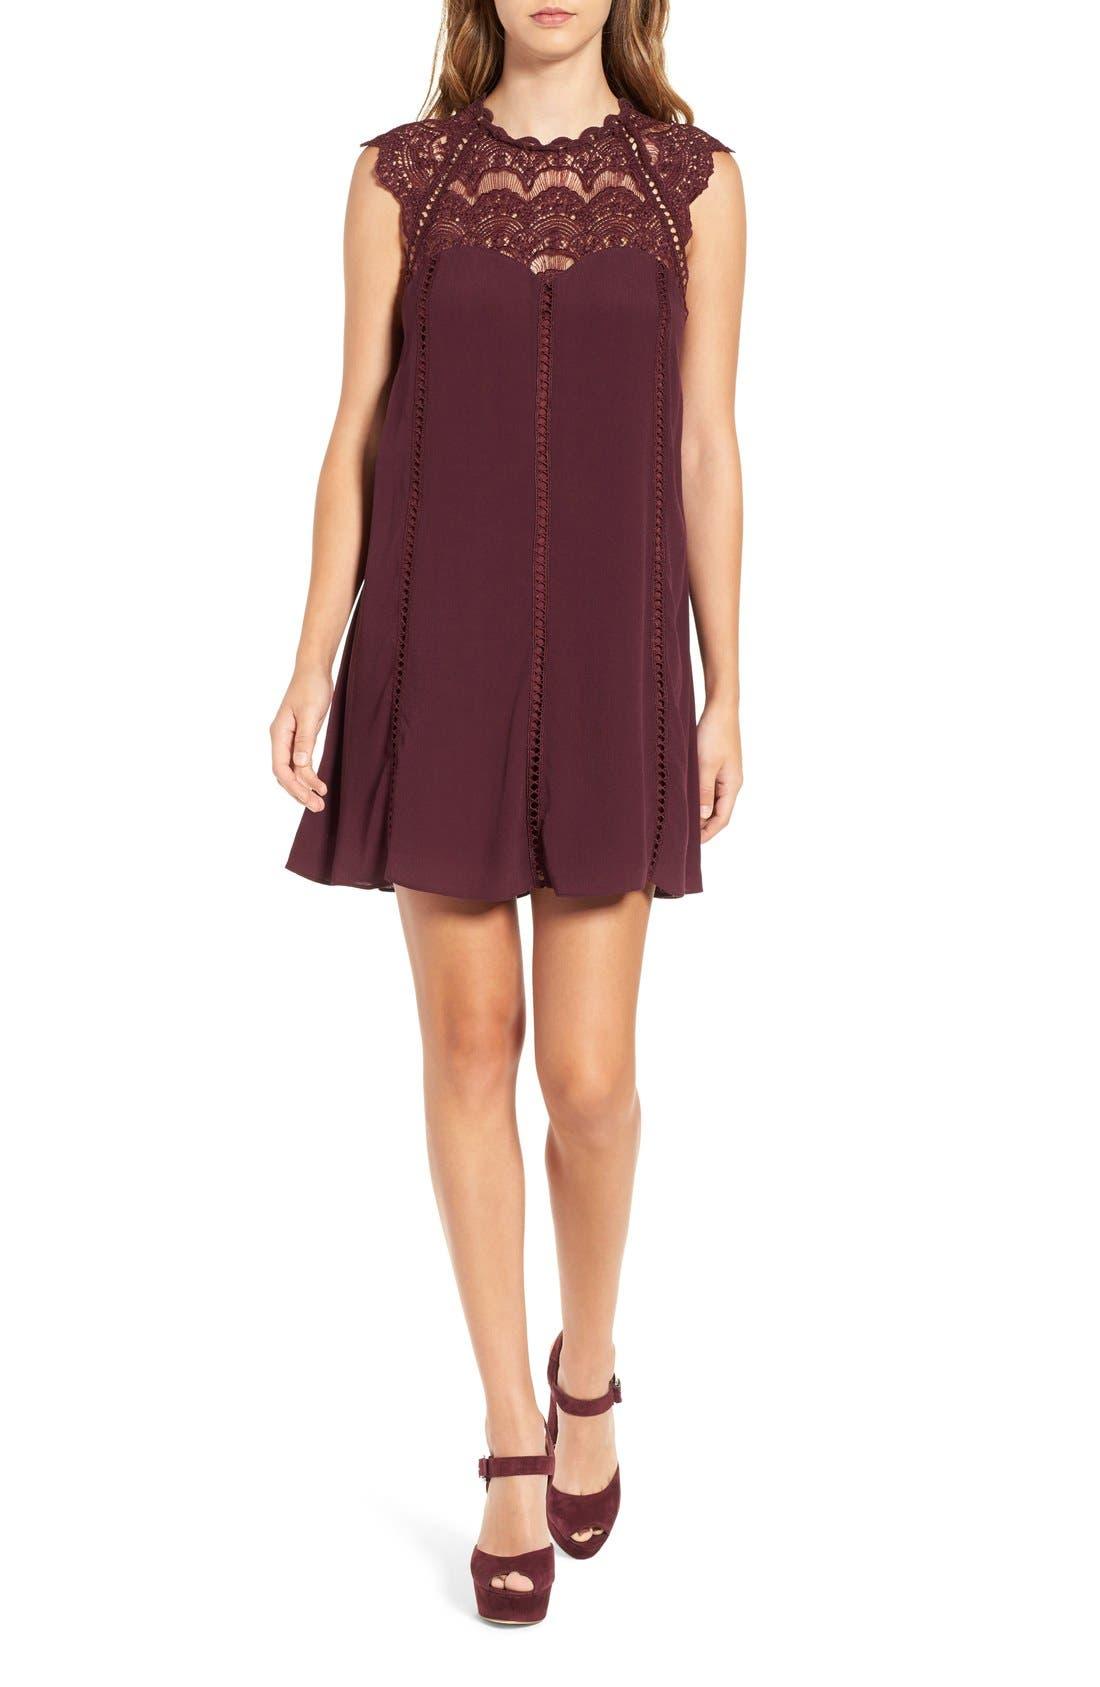 Main Image - 4SI3NNA Lace Yoke Shift Dress